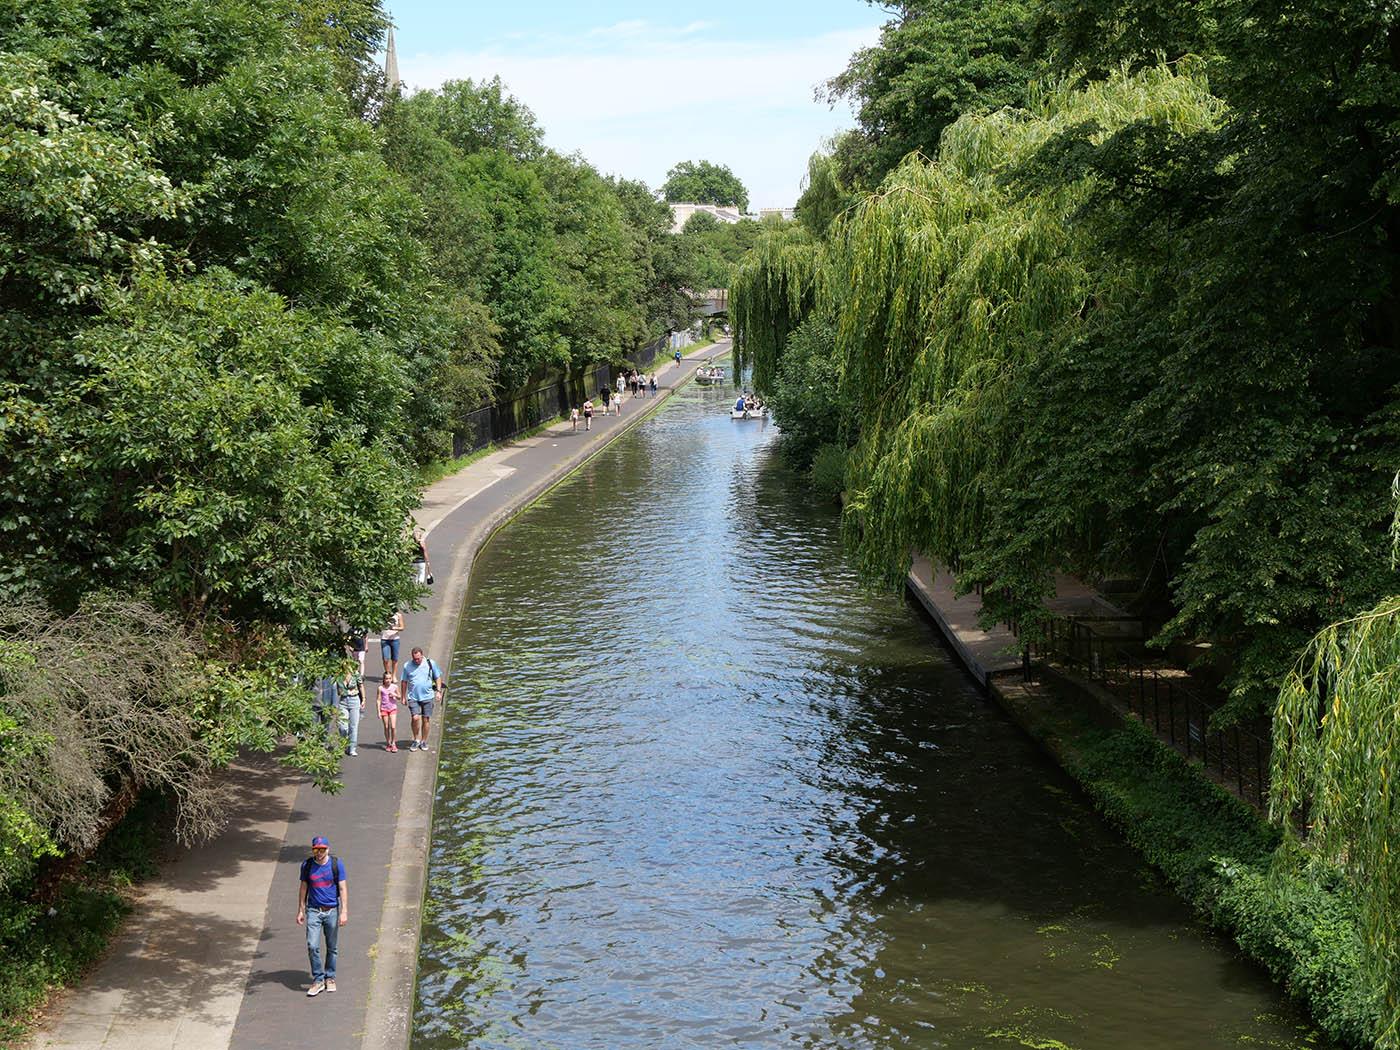 London Zoo environs